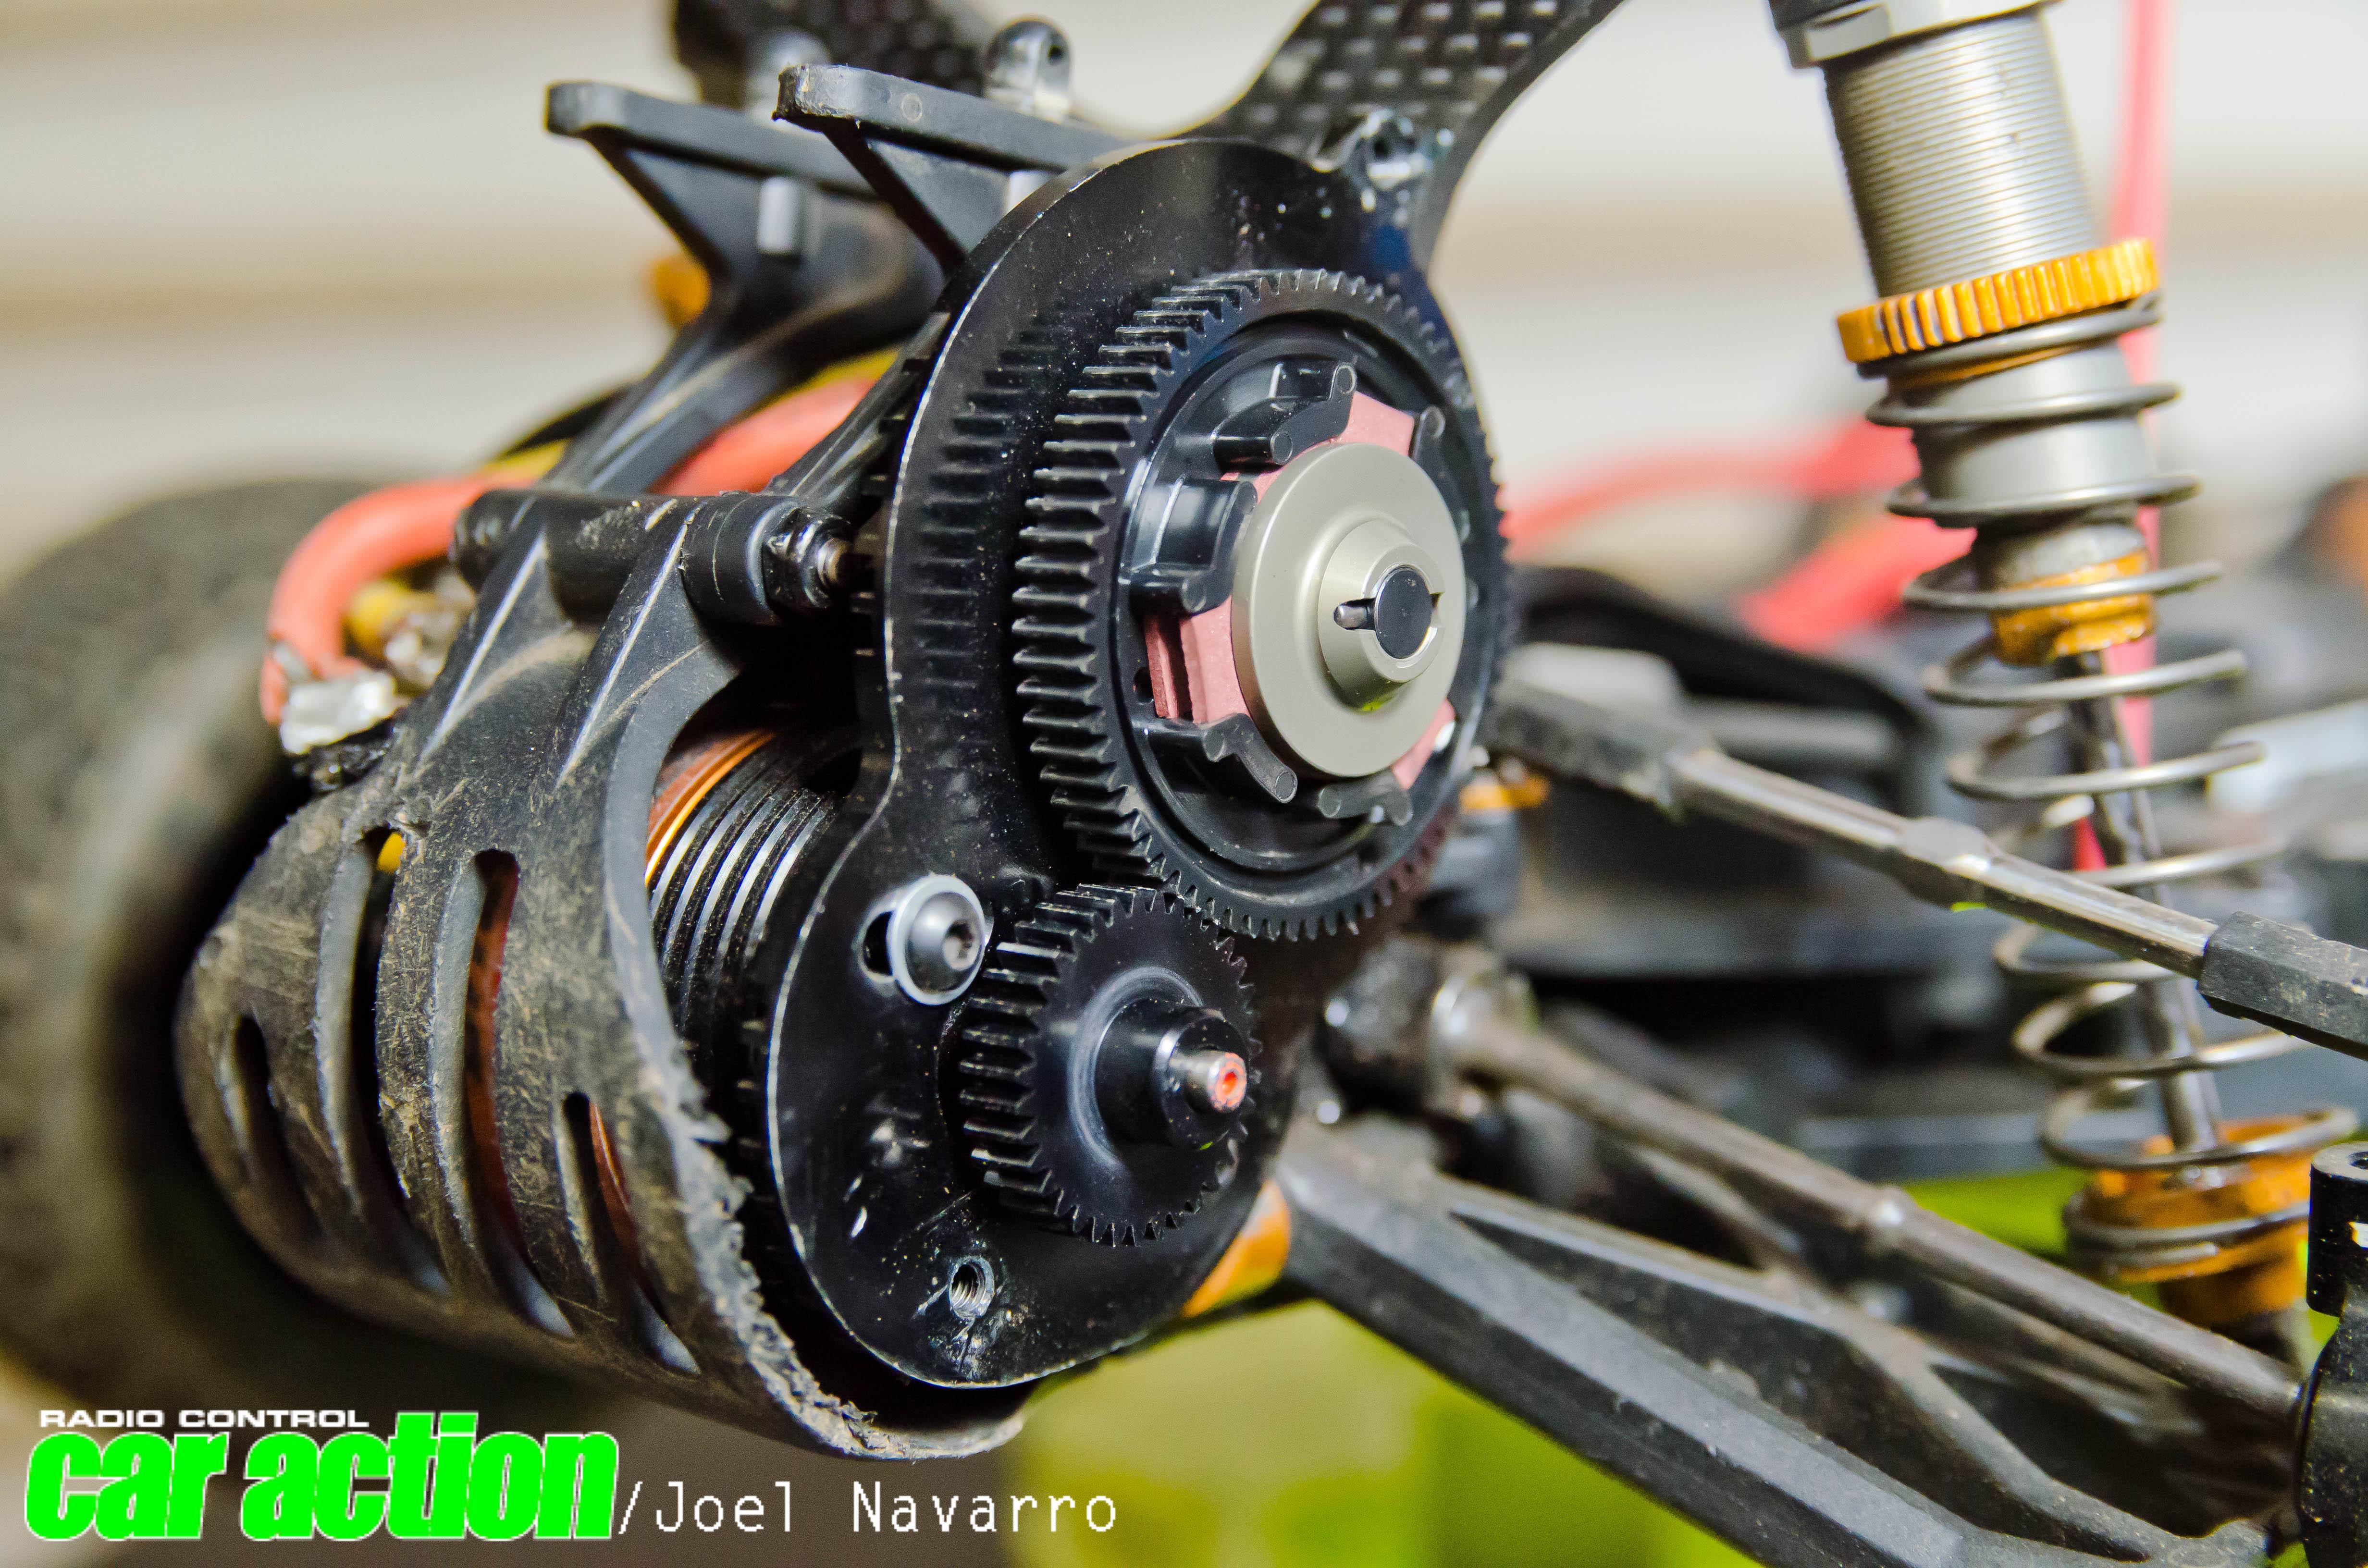 Spy Shots: Avid Triad Slipper Clutch for Durango DEX210